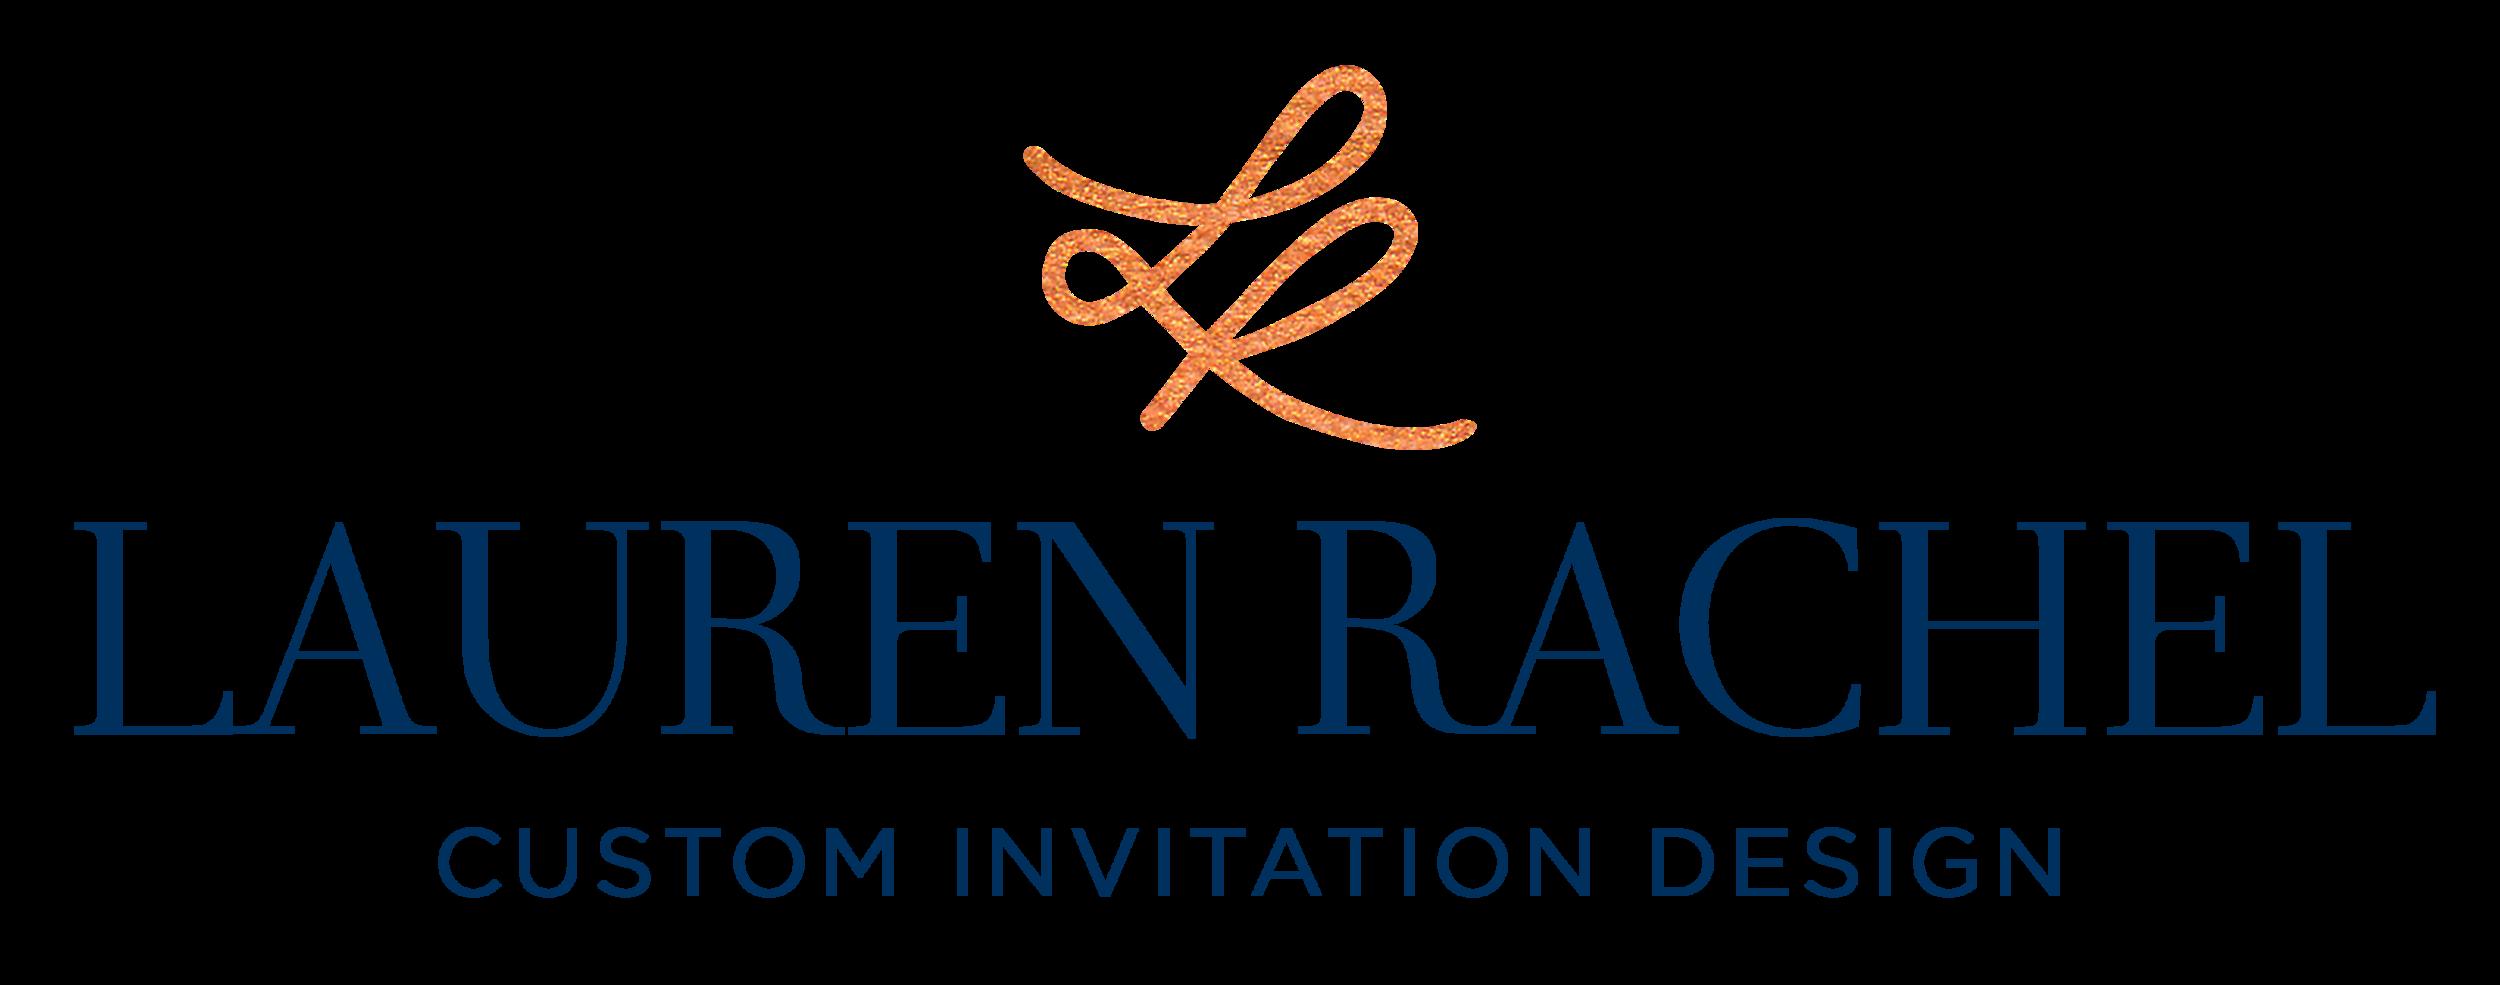 Lauren-Rachel-custom-invitation-design